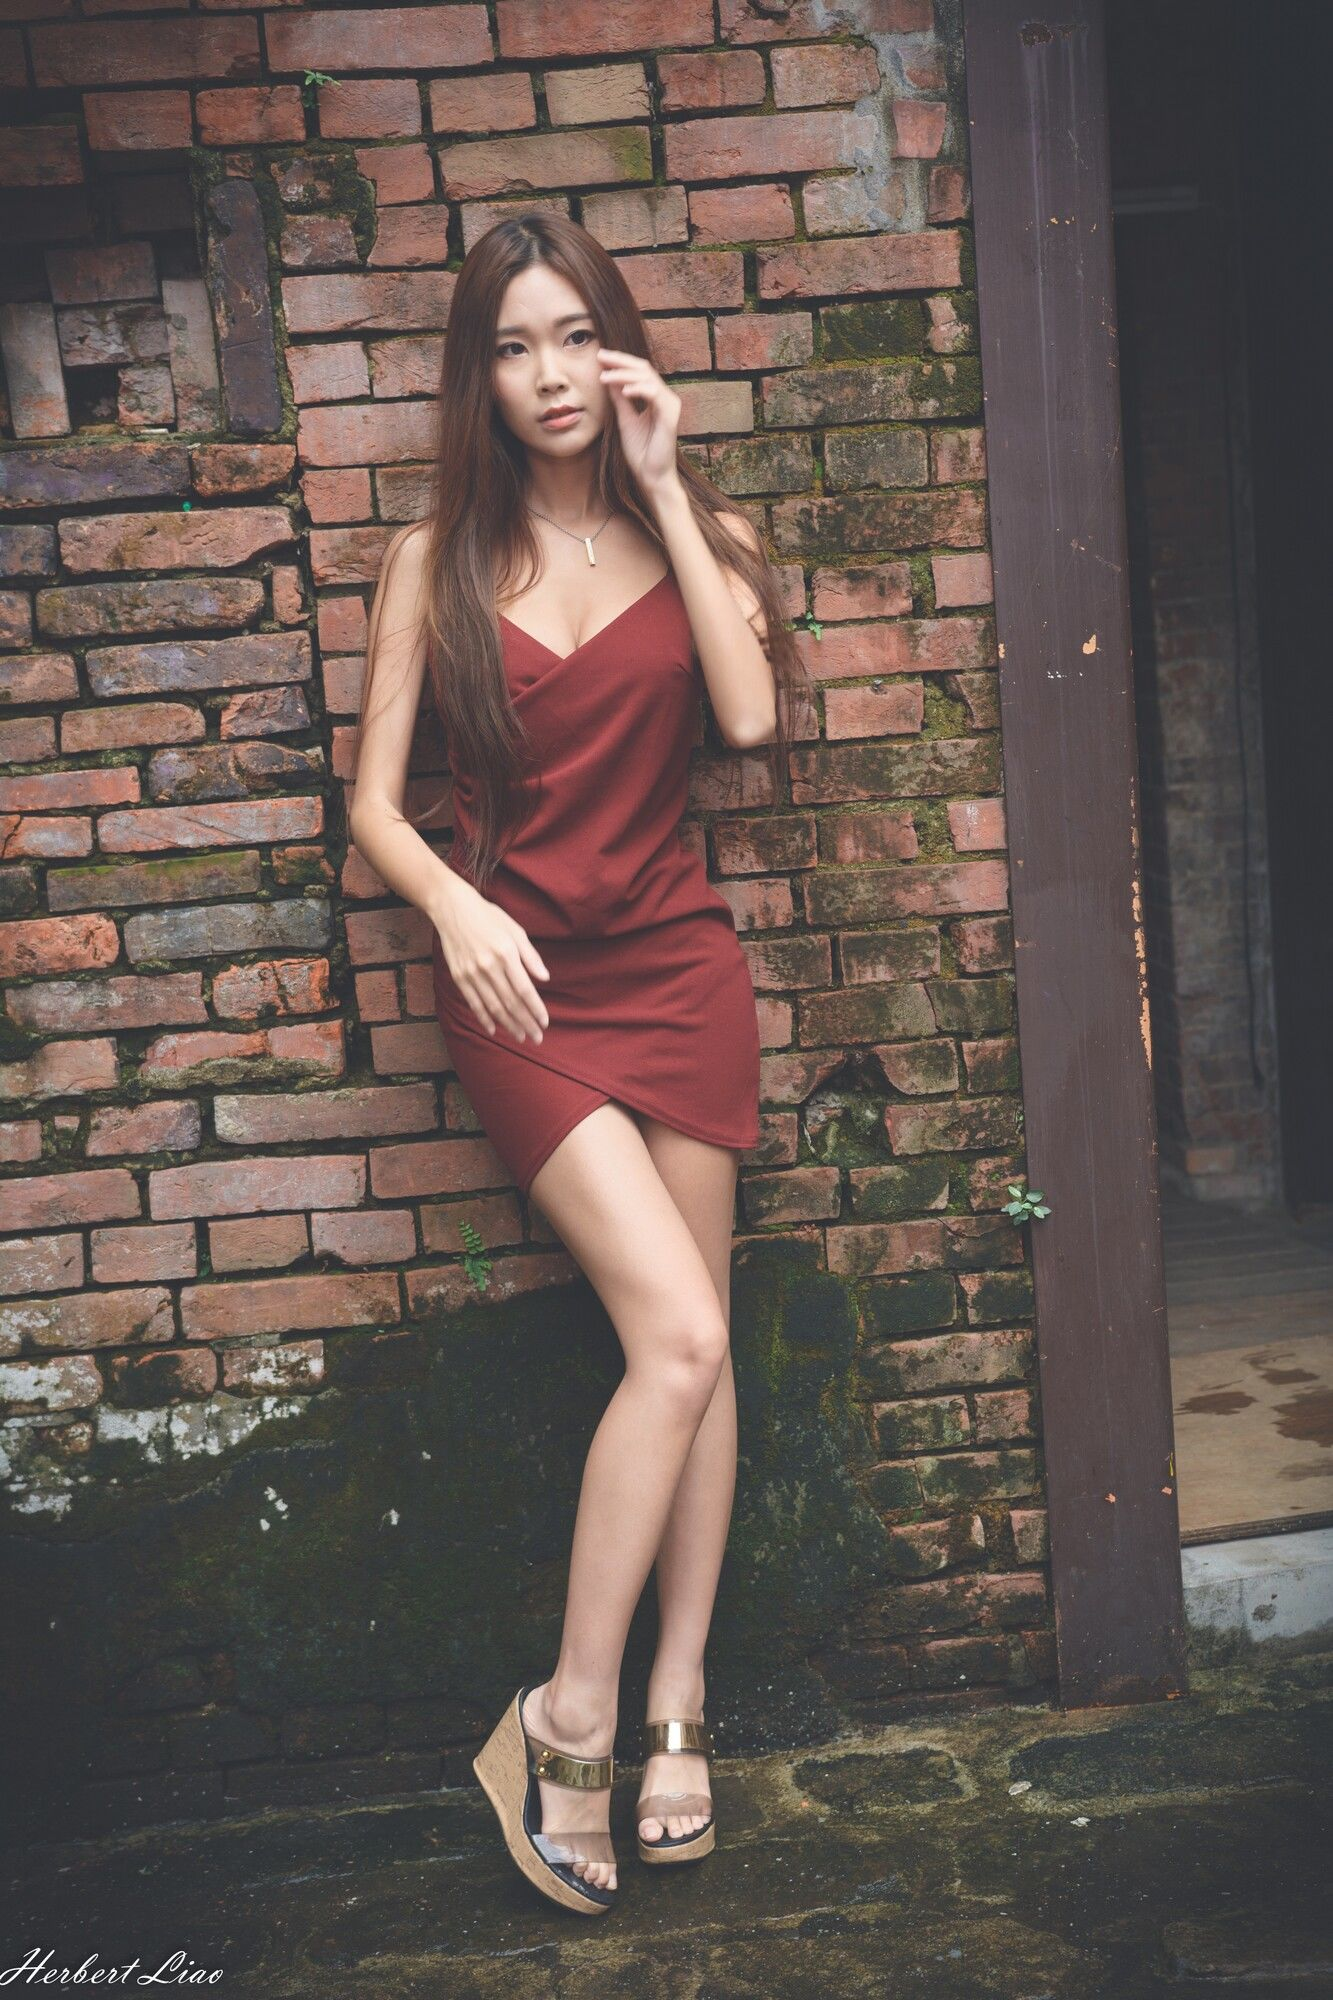 VOL.200 [台湾正妹]超短裙高跟长腿美女街拍美臀街拍美腿:黄上晏(黄上晏Rubis)超高清个人性感漂亮大图(69P)